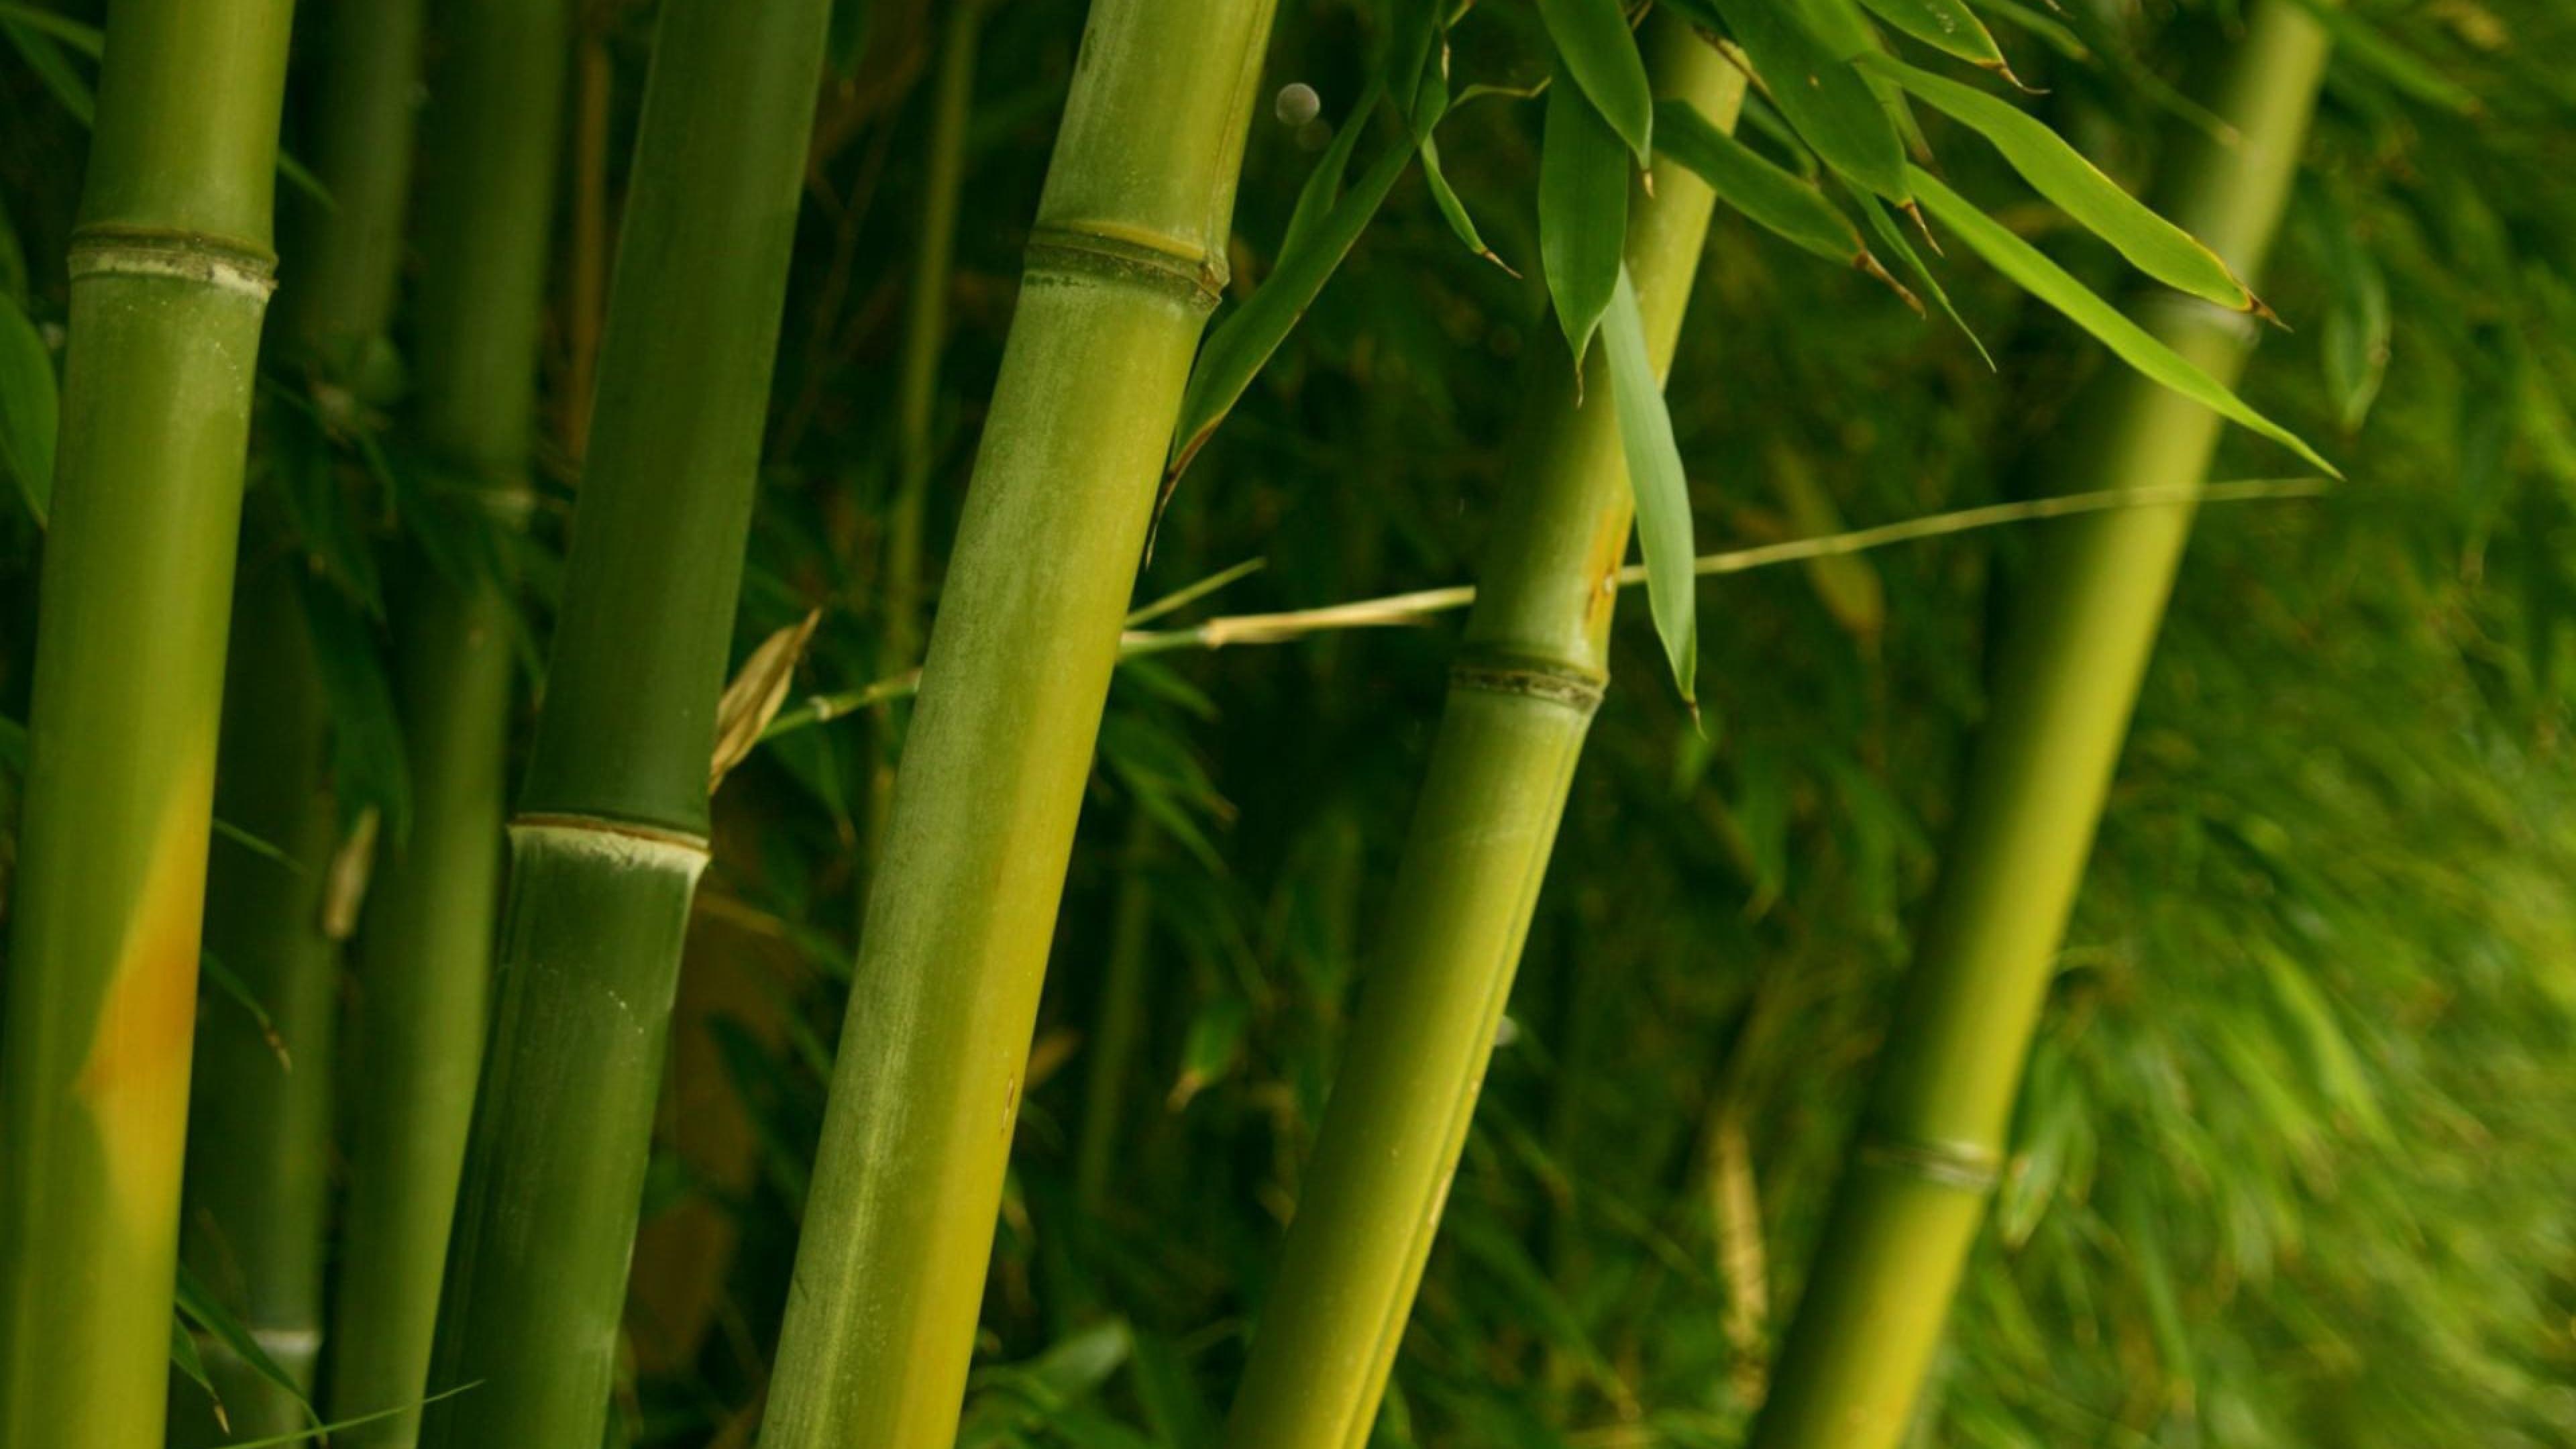 bamboo_green_stalks_leaves_7157_3840x2160